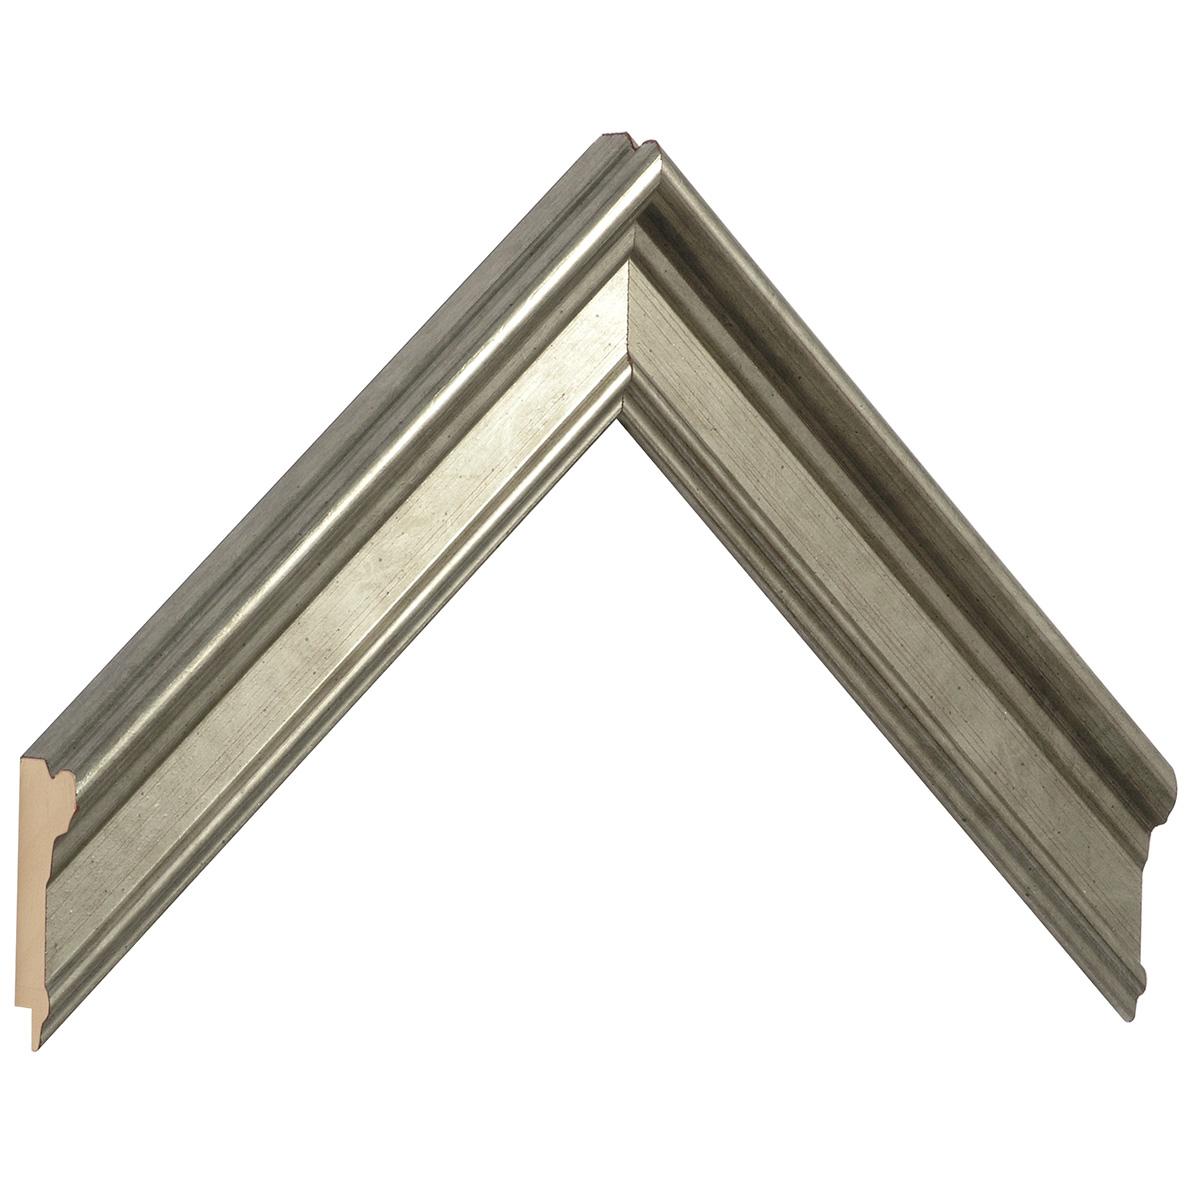 Moulding finger-joint pine Width 34mm, Silver